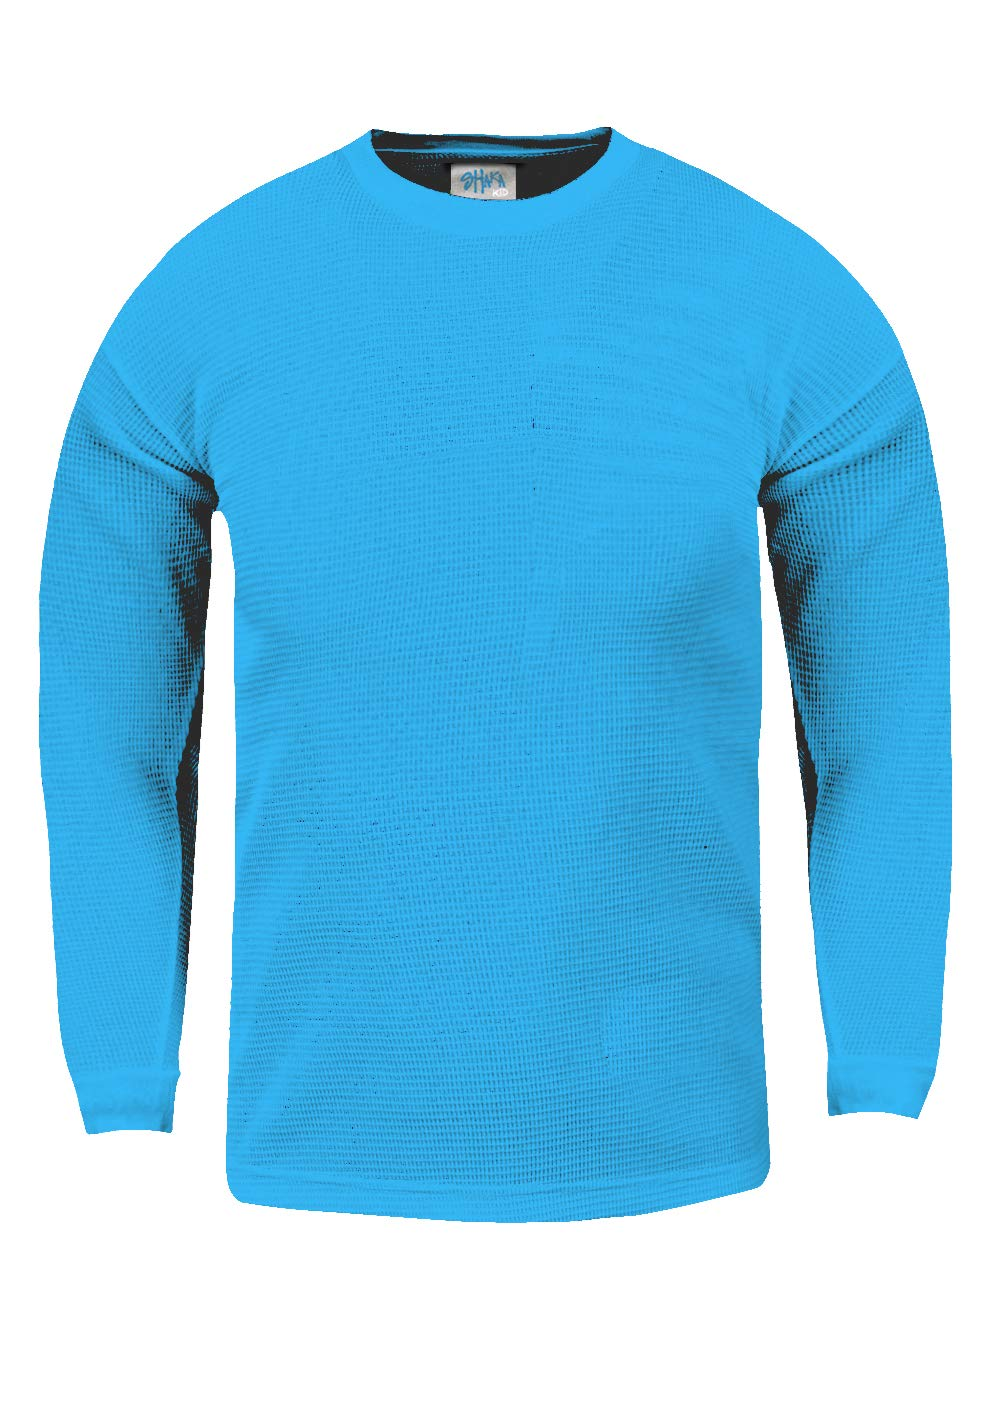 KTC09_XL Thermal Long Sleeve Crewneck Waffle Shirt Turquoise XL by Shaka Wear